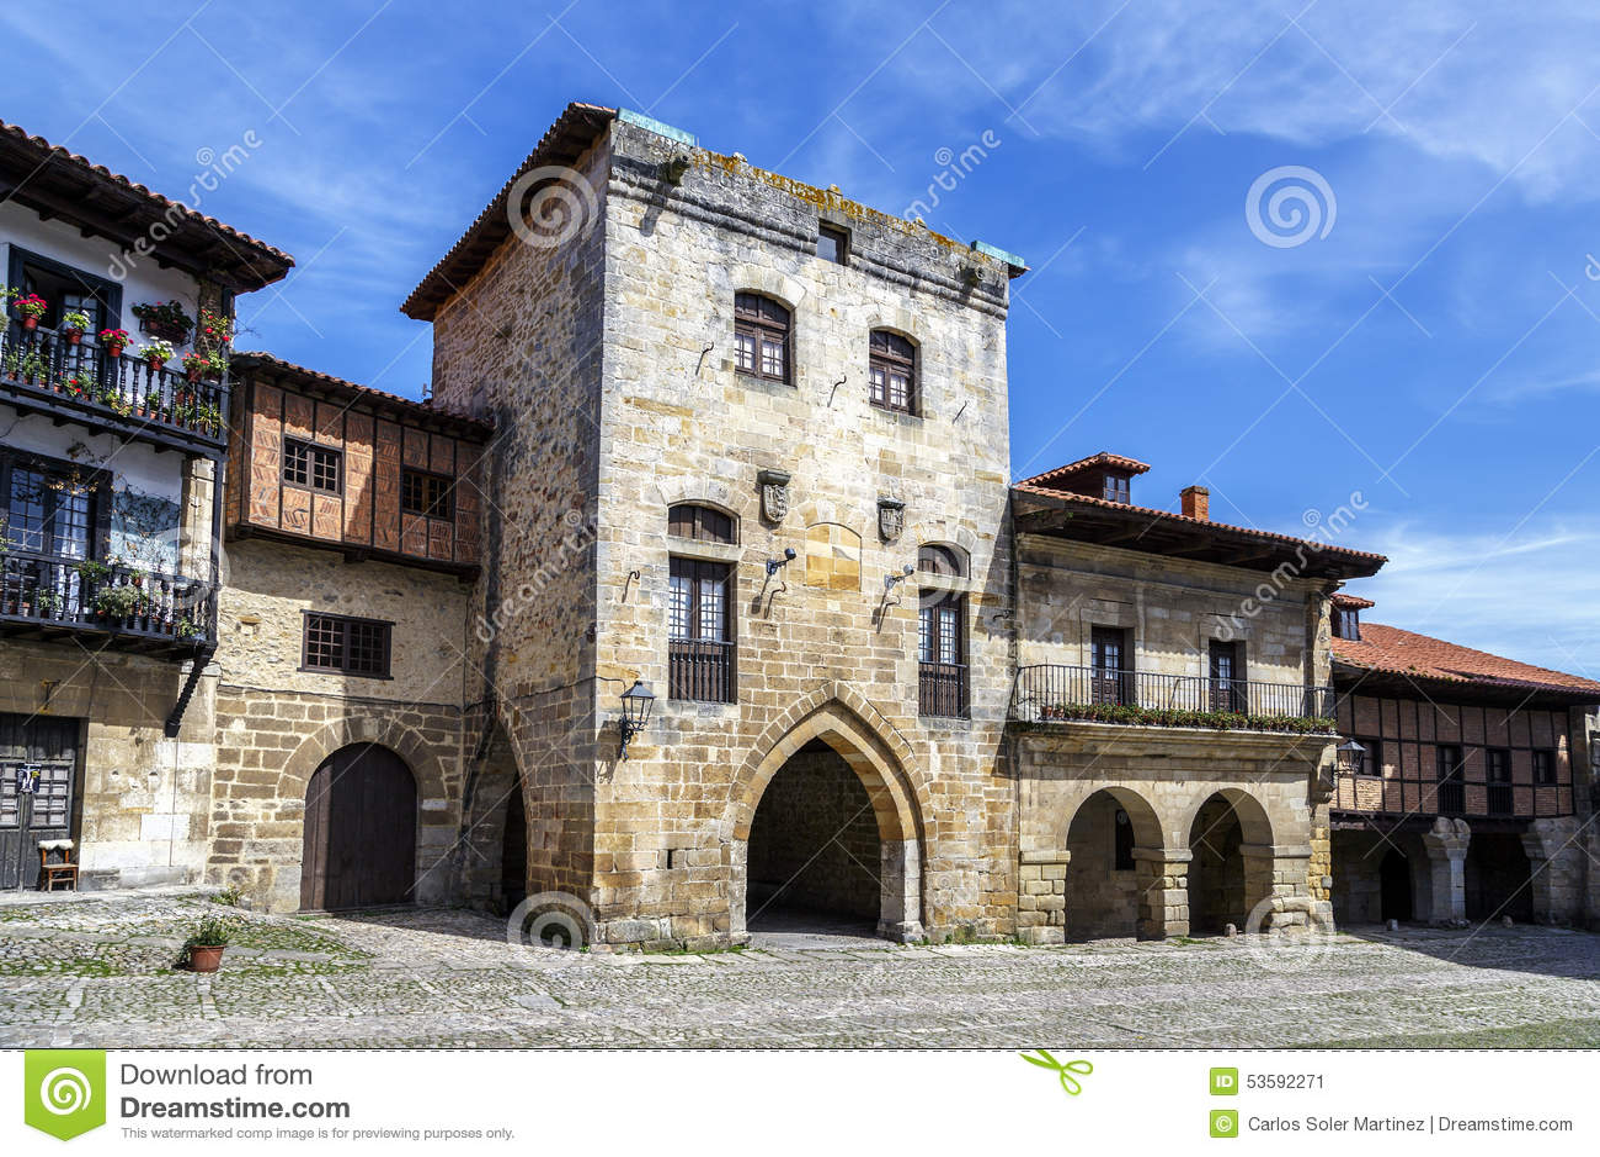 Arquitectura t pica en santillana del mar una ciudad for Arquitectura de espana